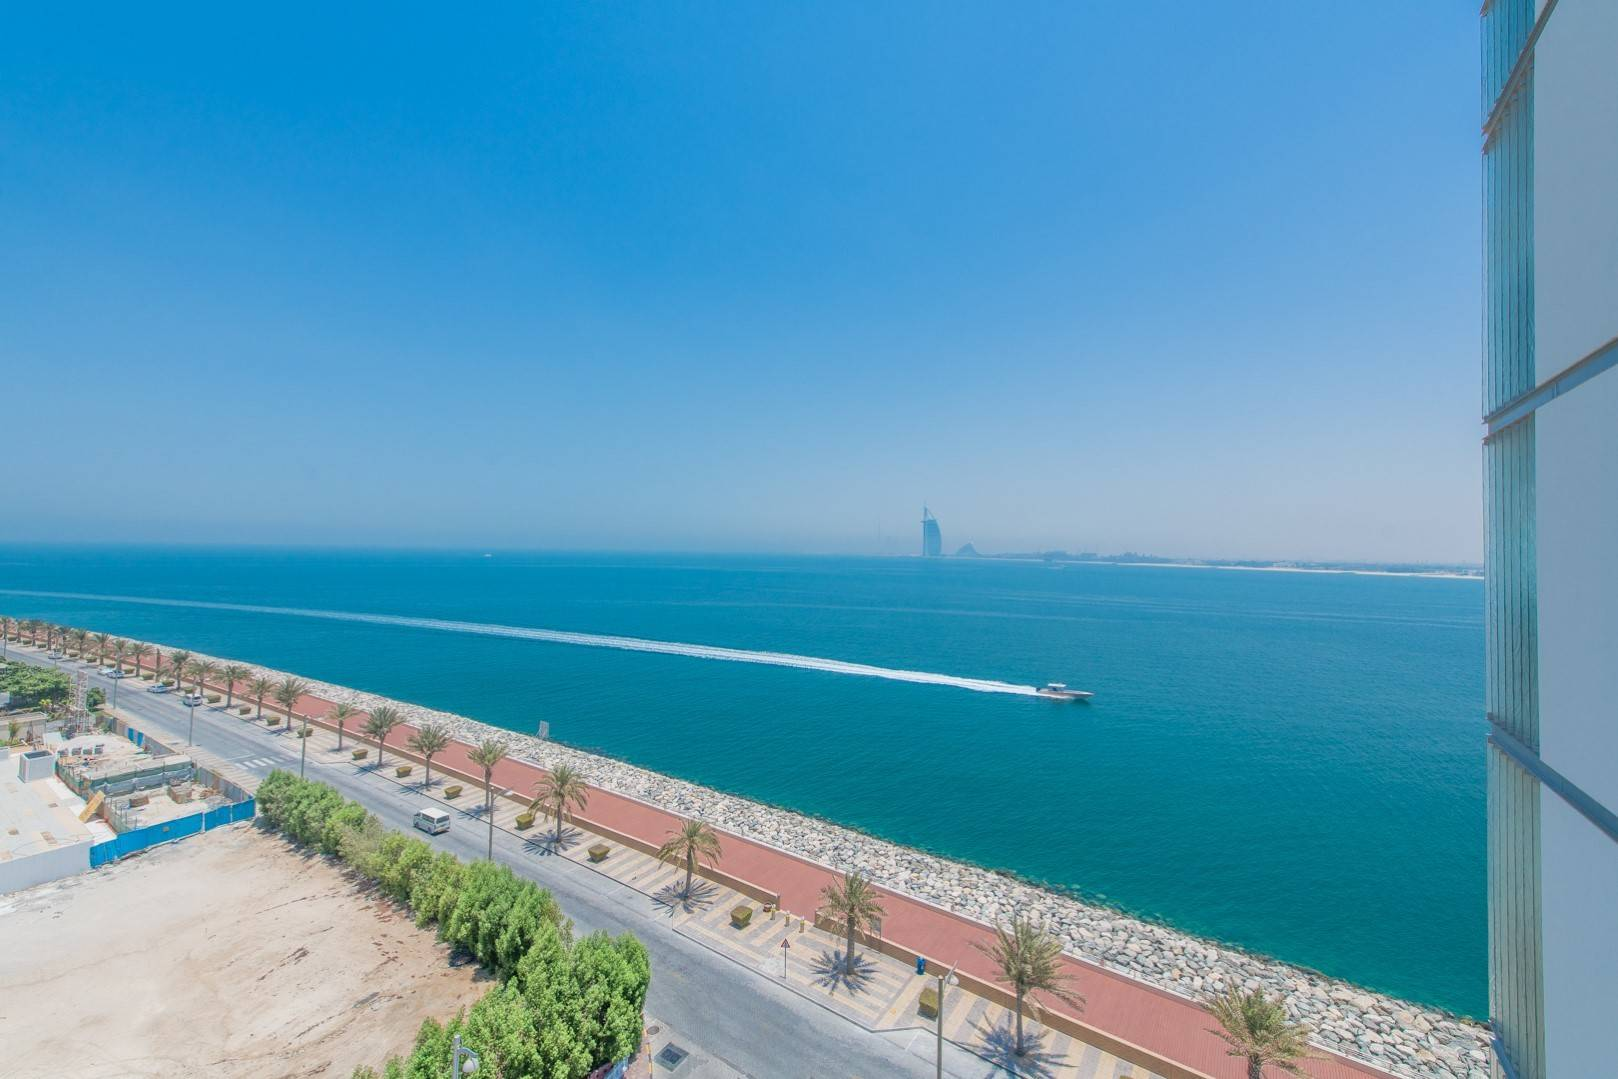 Penthouse, sale in Muraba Residences Dubai, UAE